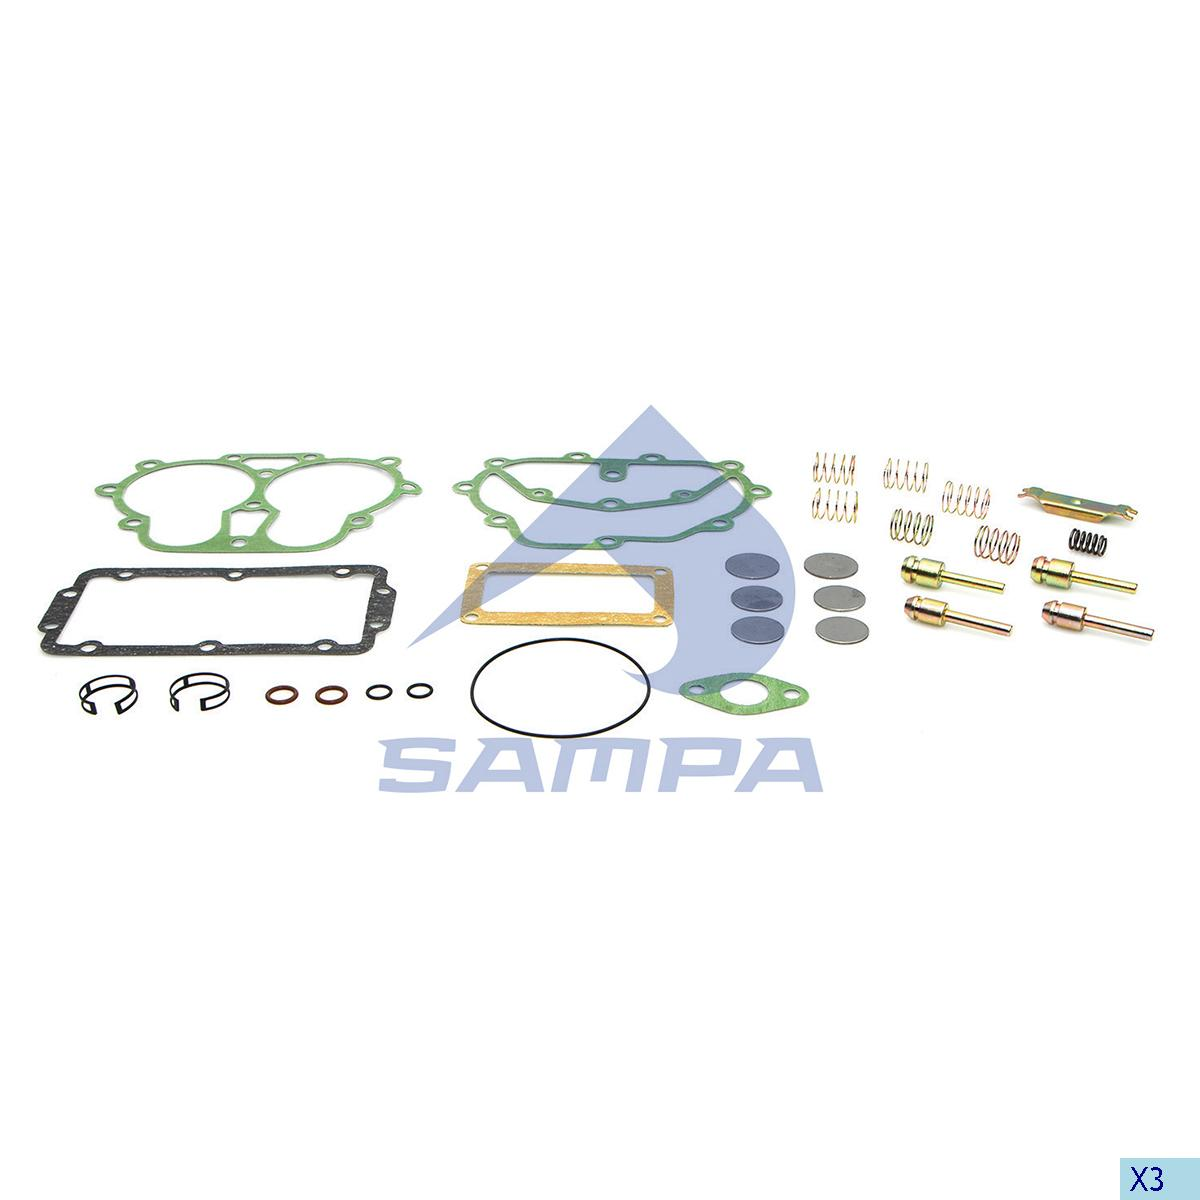 Repair Kit, Compressor, Scania, Compressed Air System